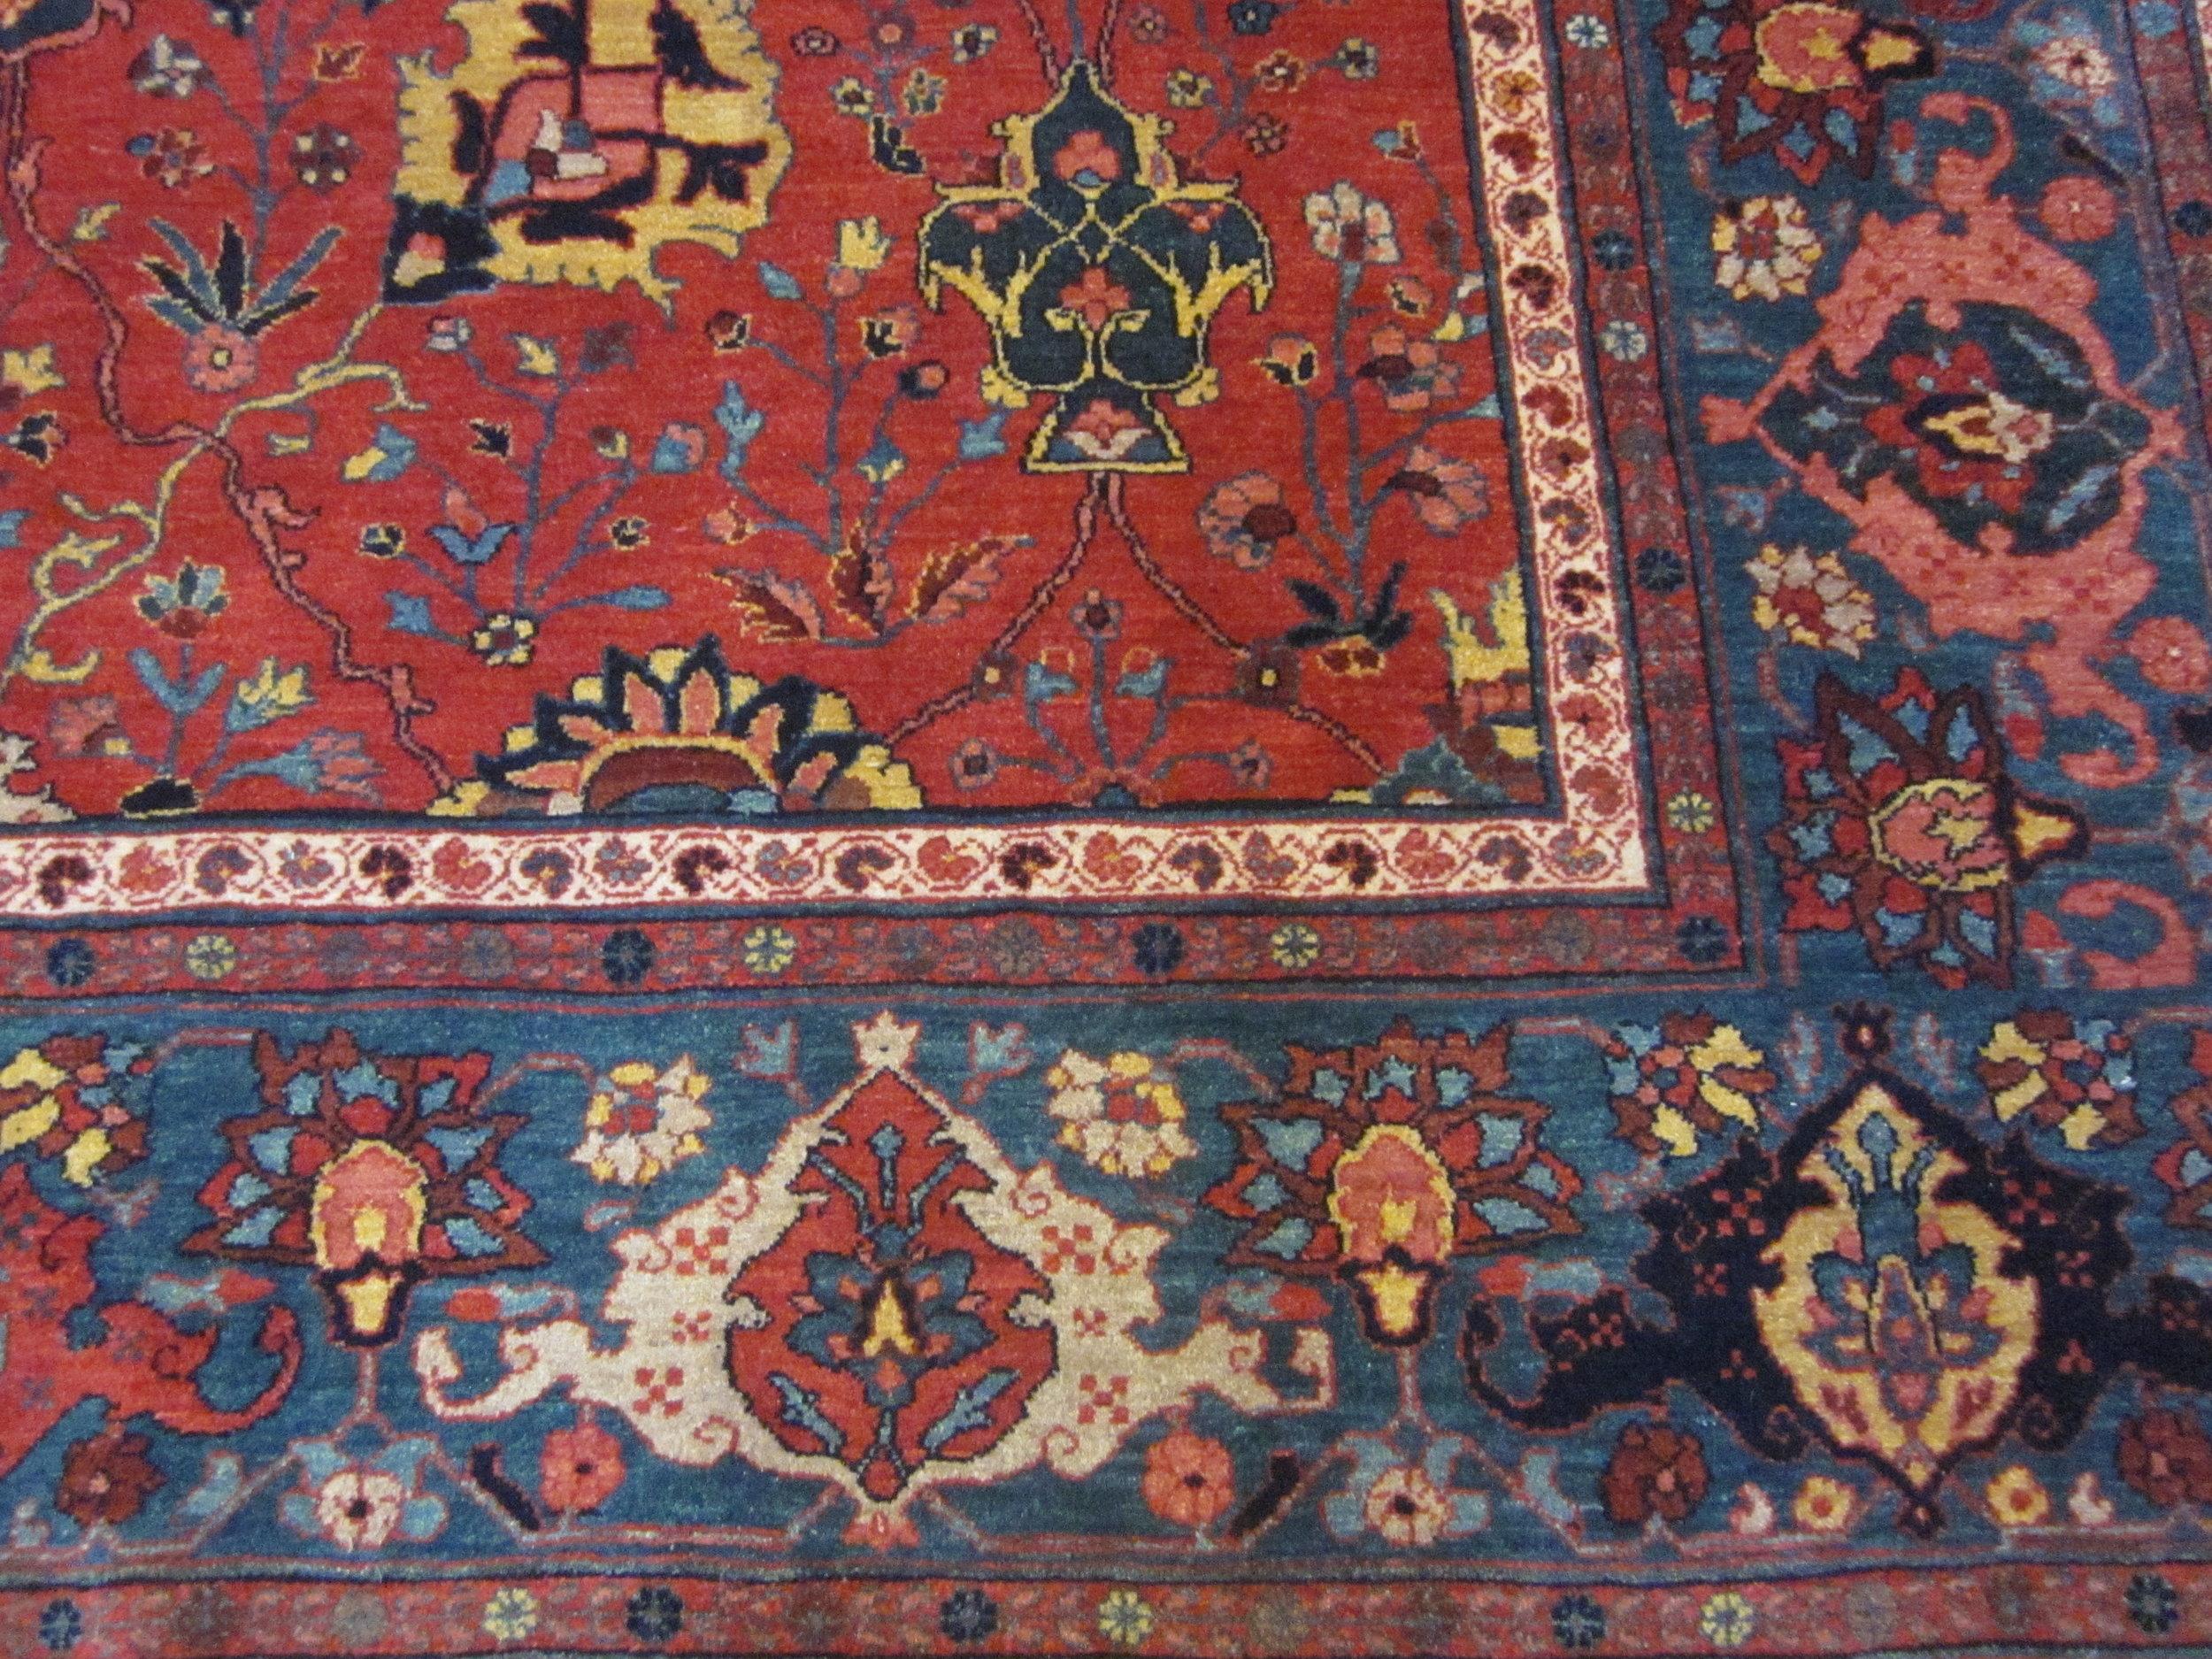 #42b) 8 x 11 Bijar carpet, border close-up. Beautiful jewel tones!